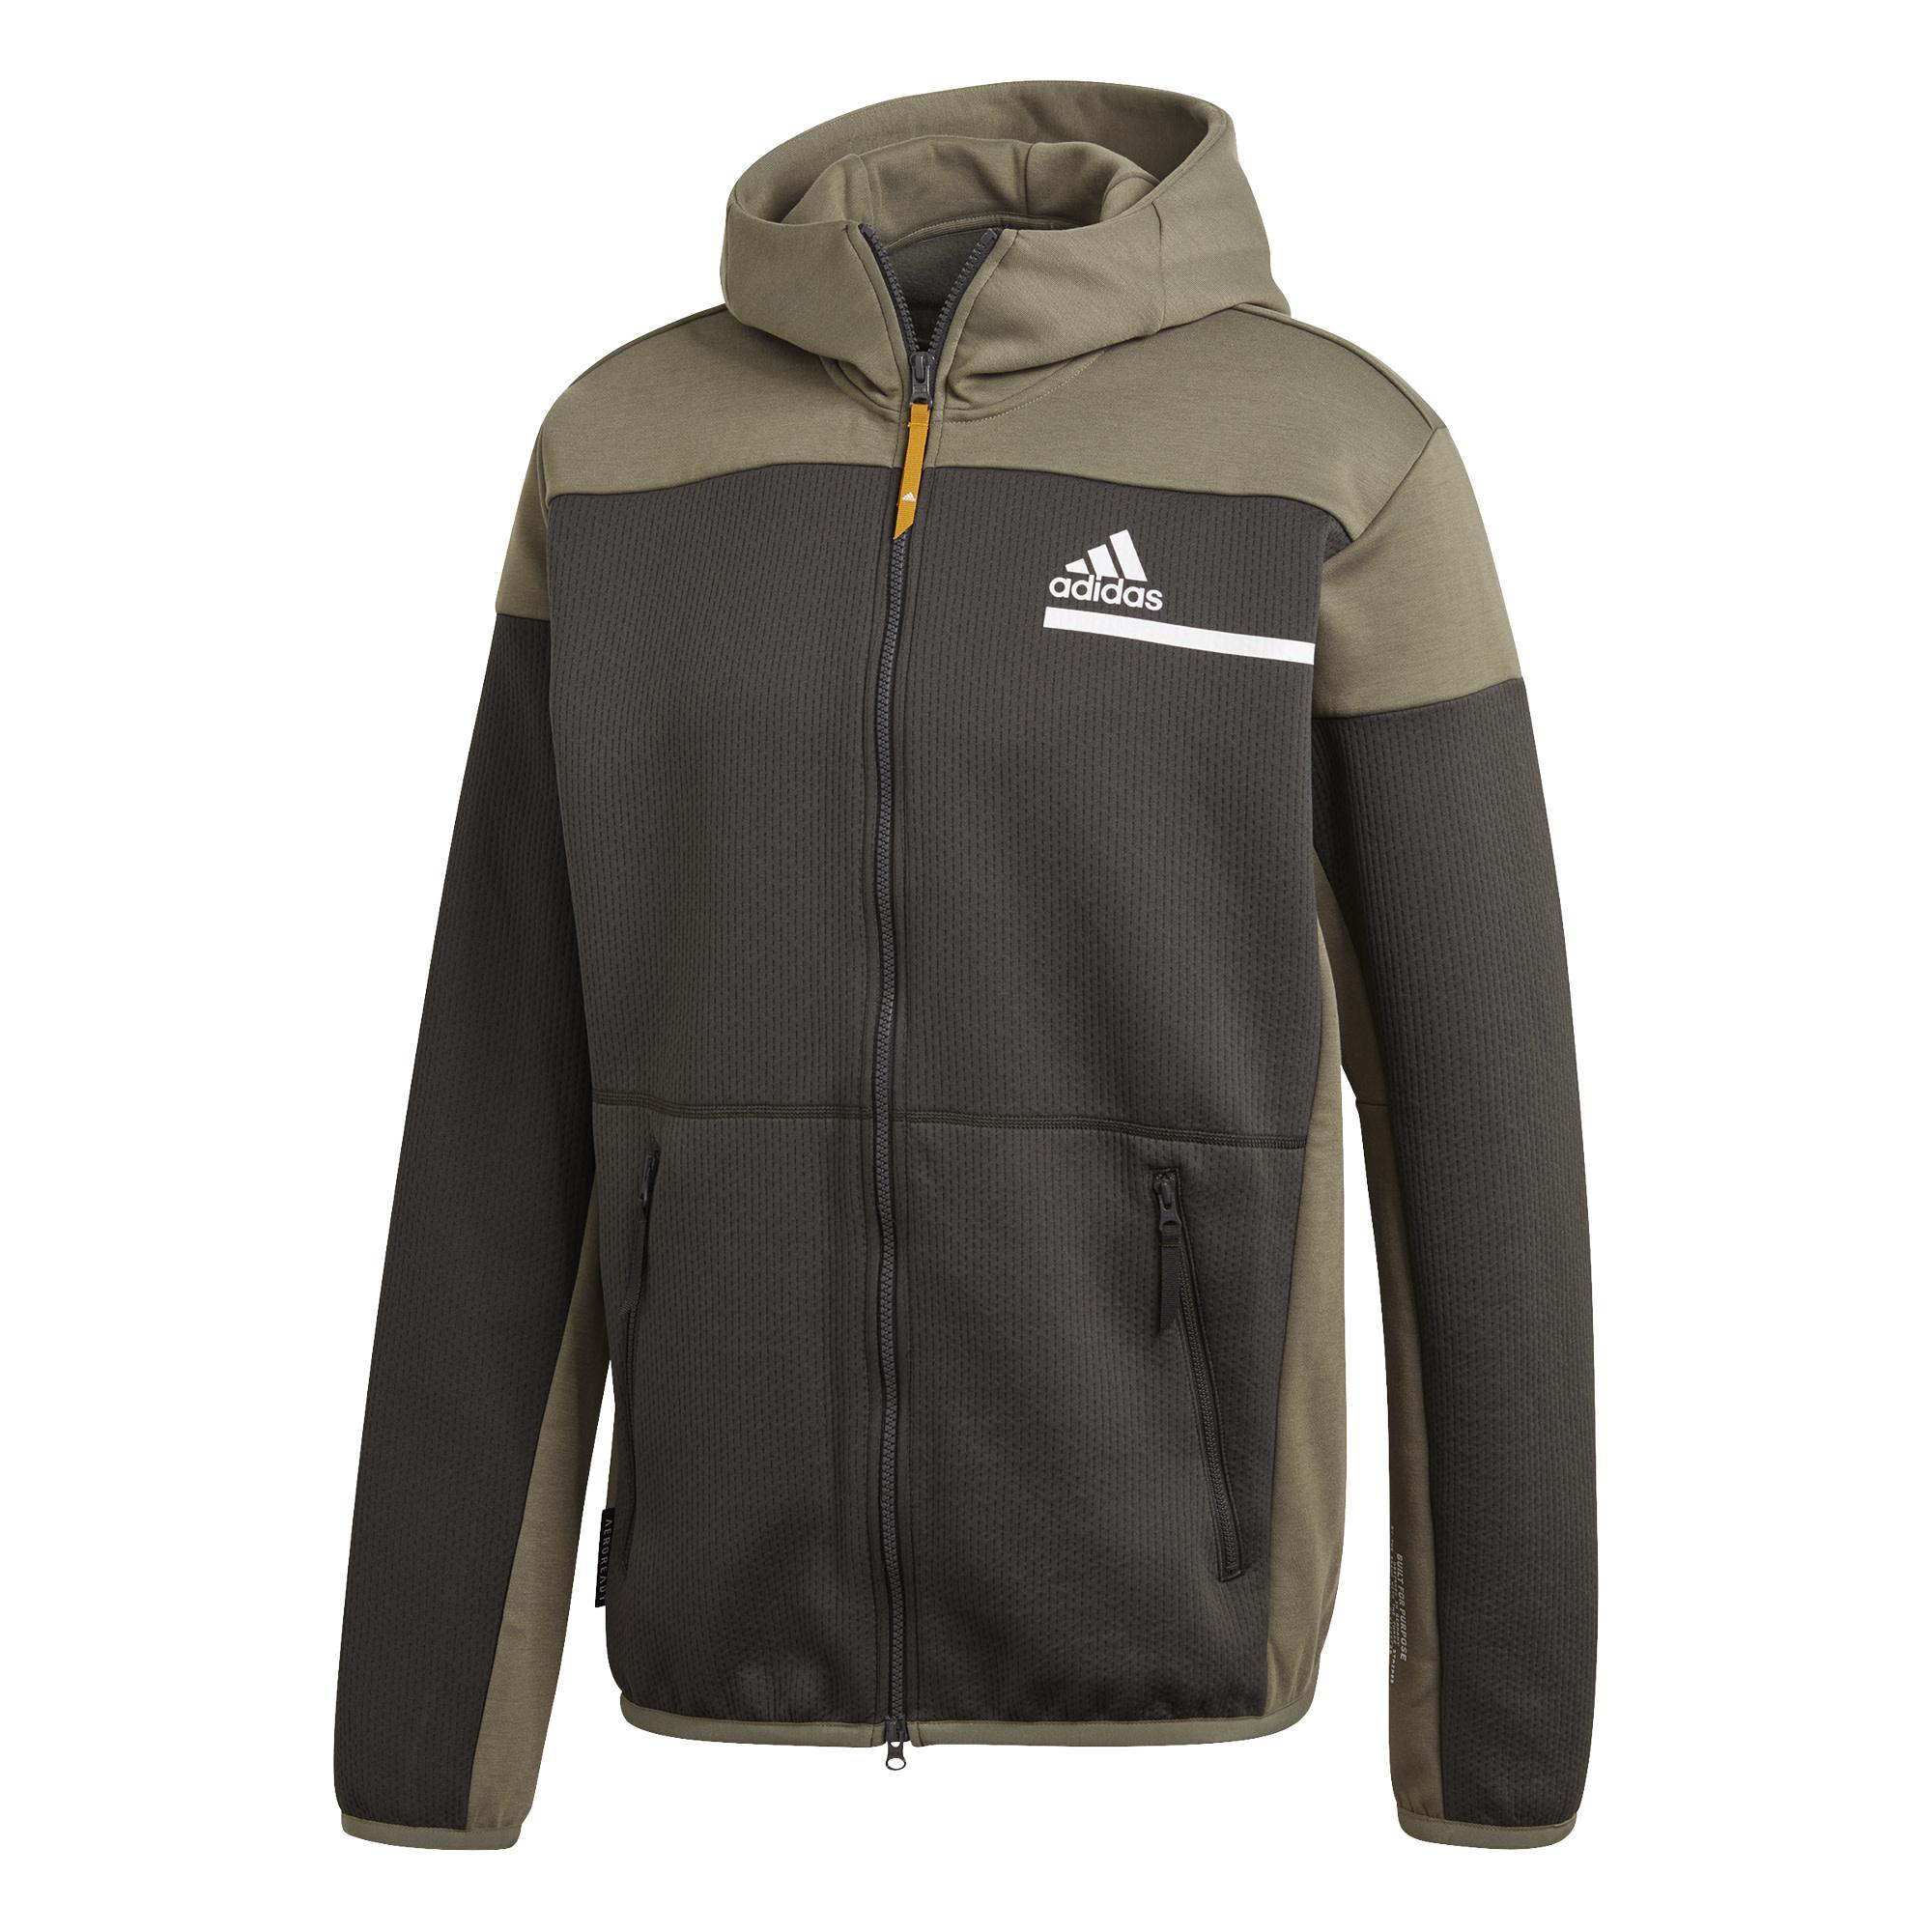 Adidas ADIDAS ZNE Aeroready Hoody